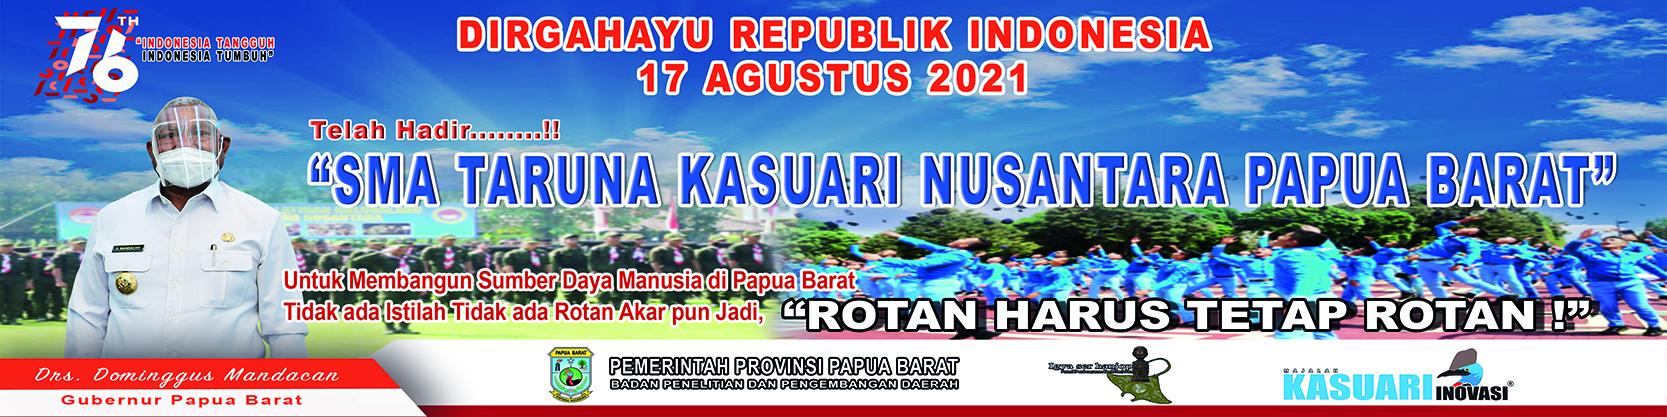 Dirgahayu Republik Indonesia 17 Agustus 2021